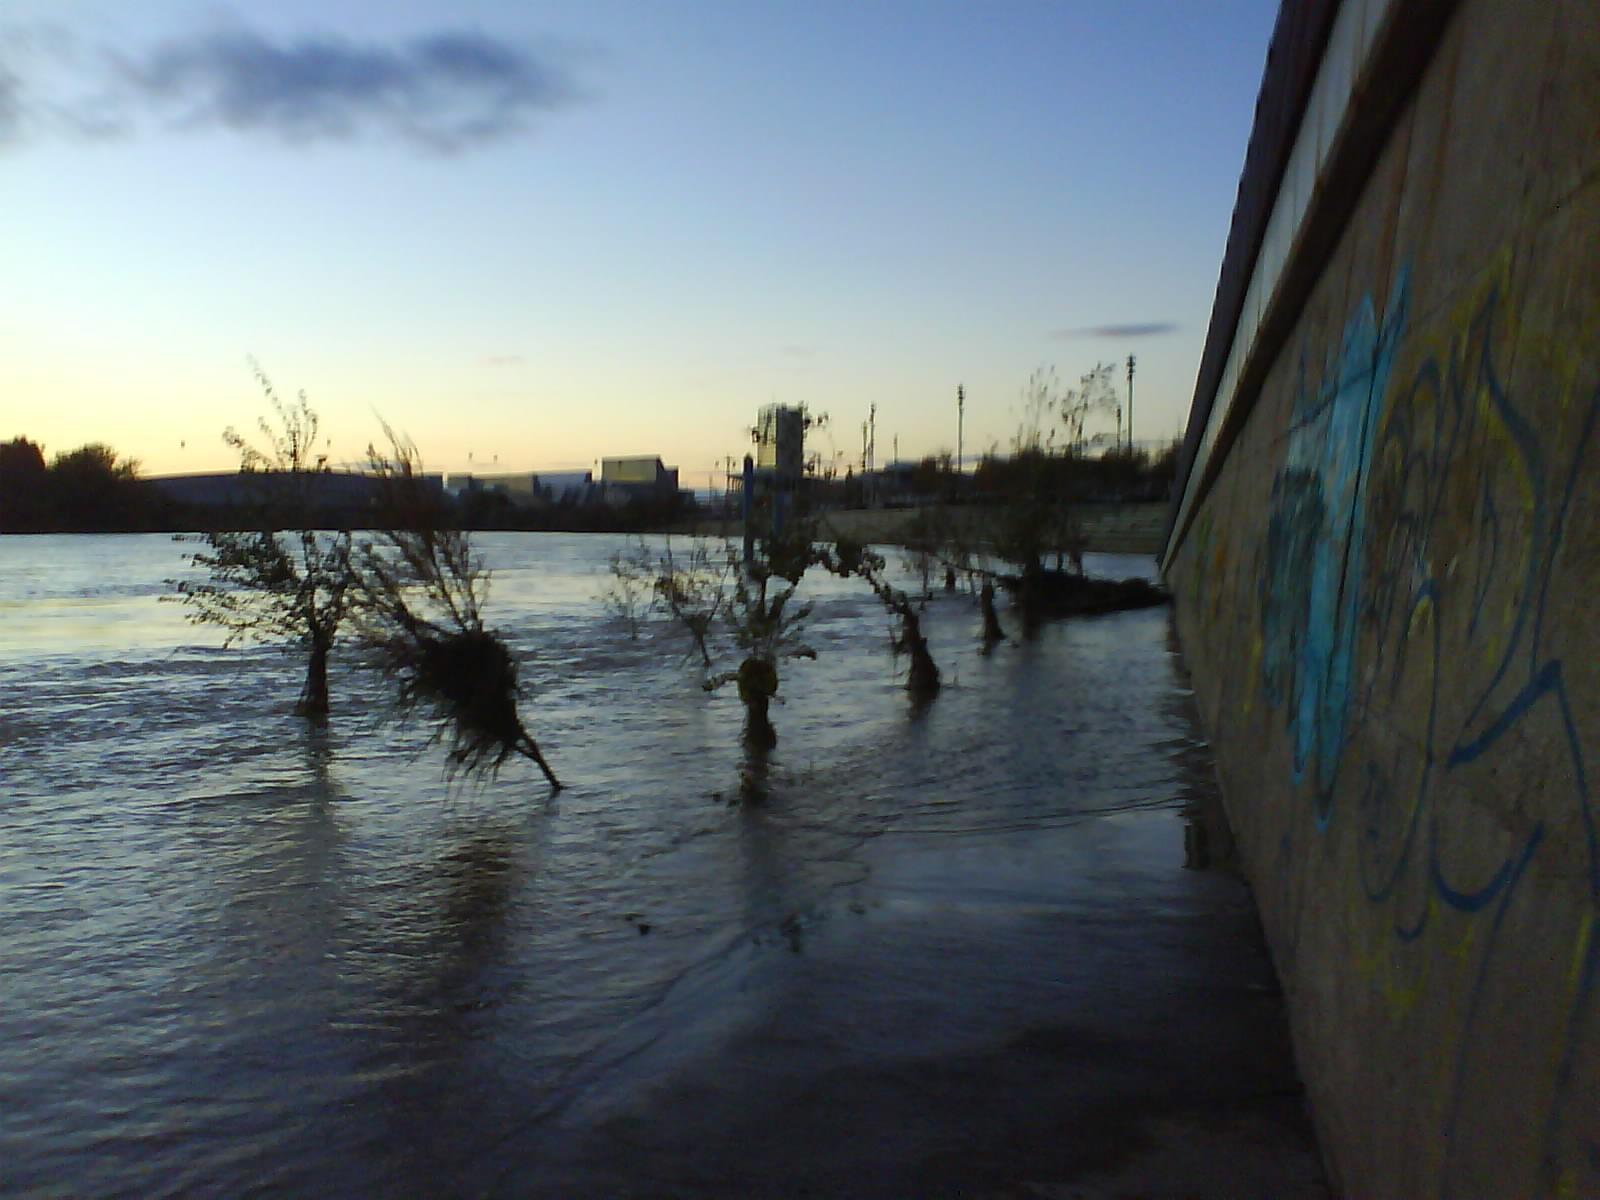 Ebro inunda camino orilla expo